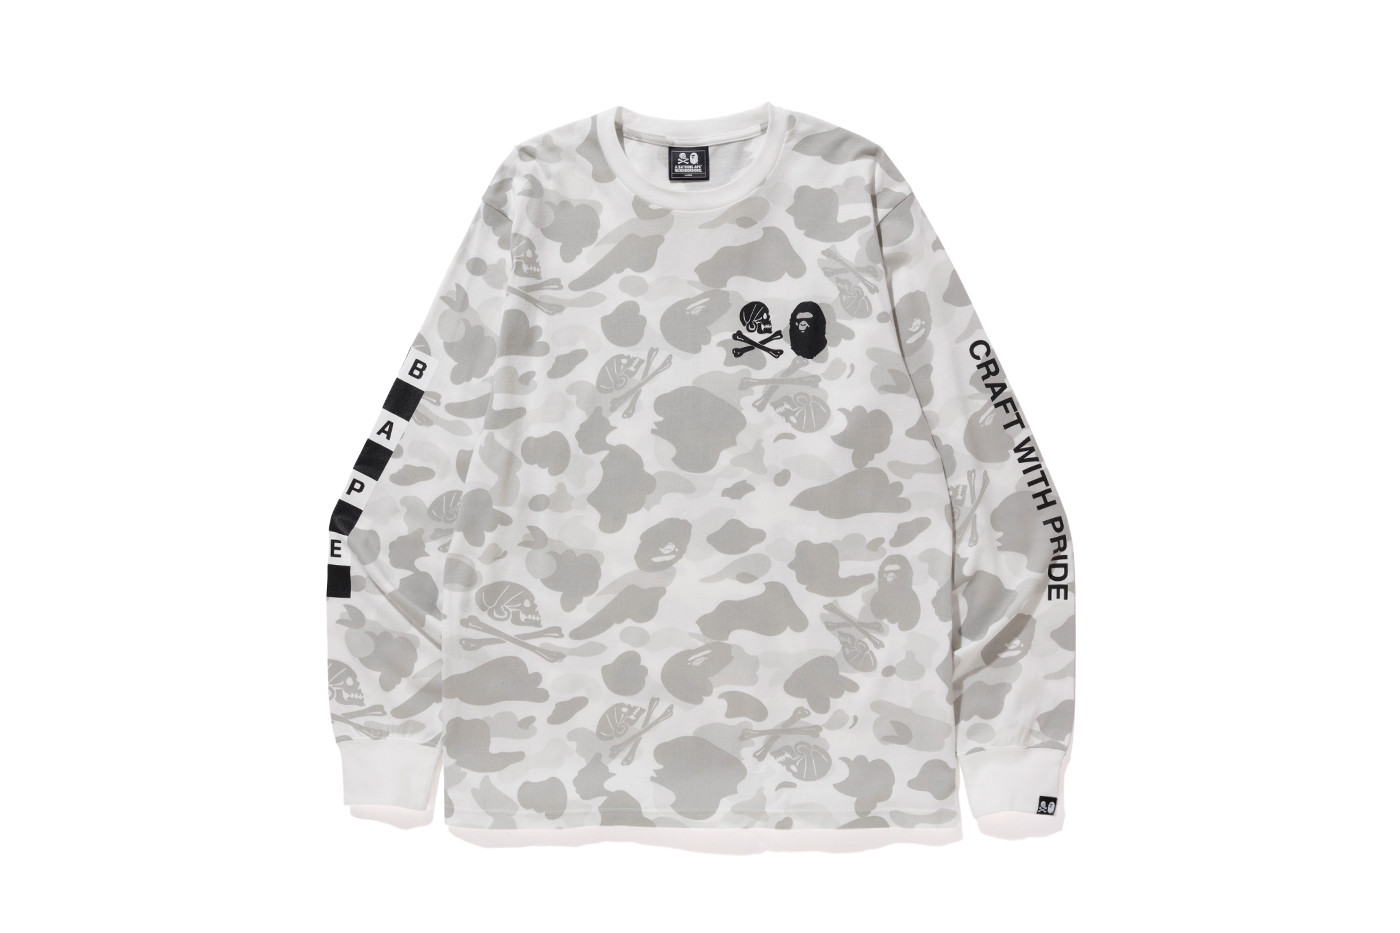 outlet store c31d2 82fe4 X Neighborhood Camo Long Sleeve Tee White